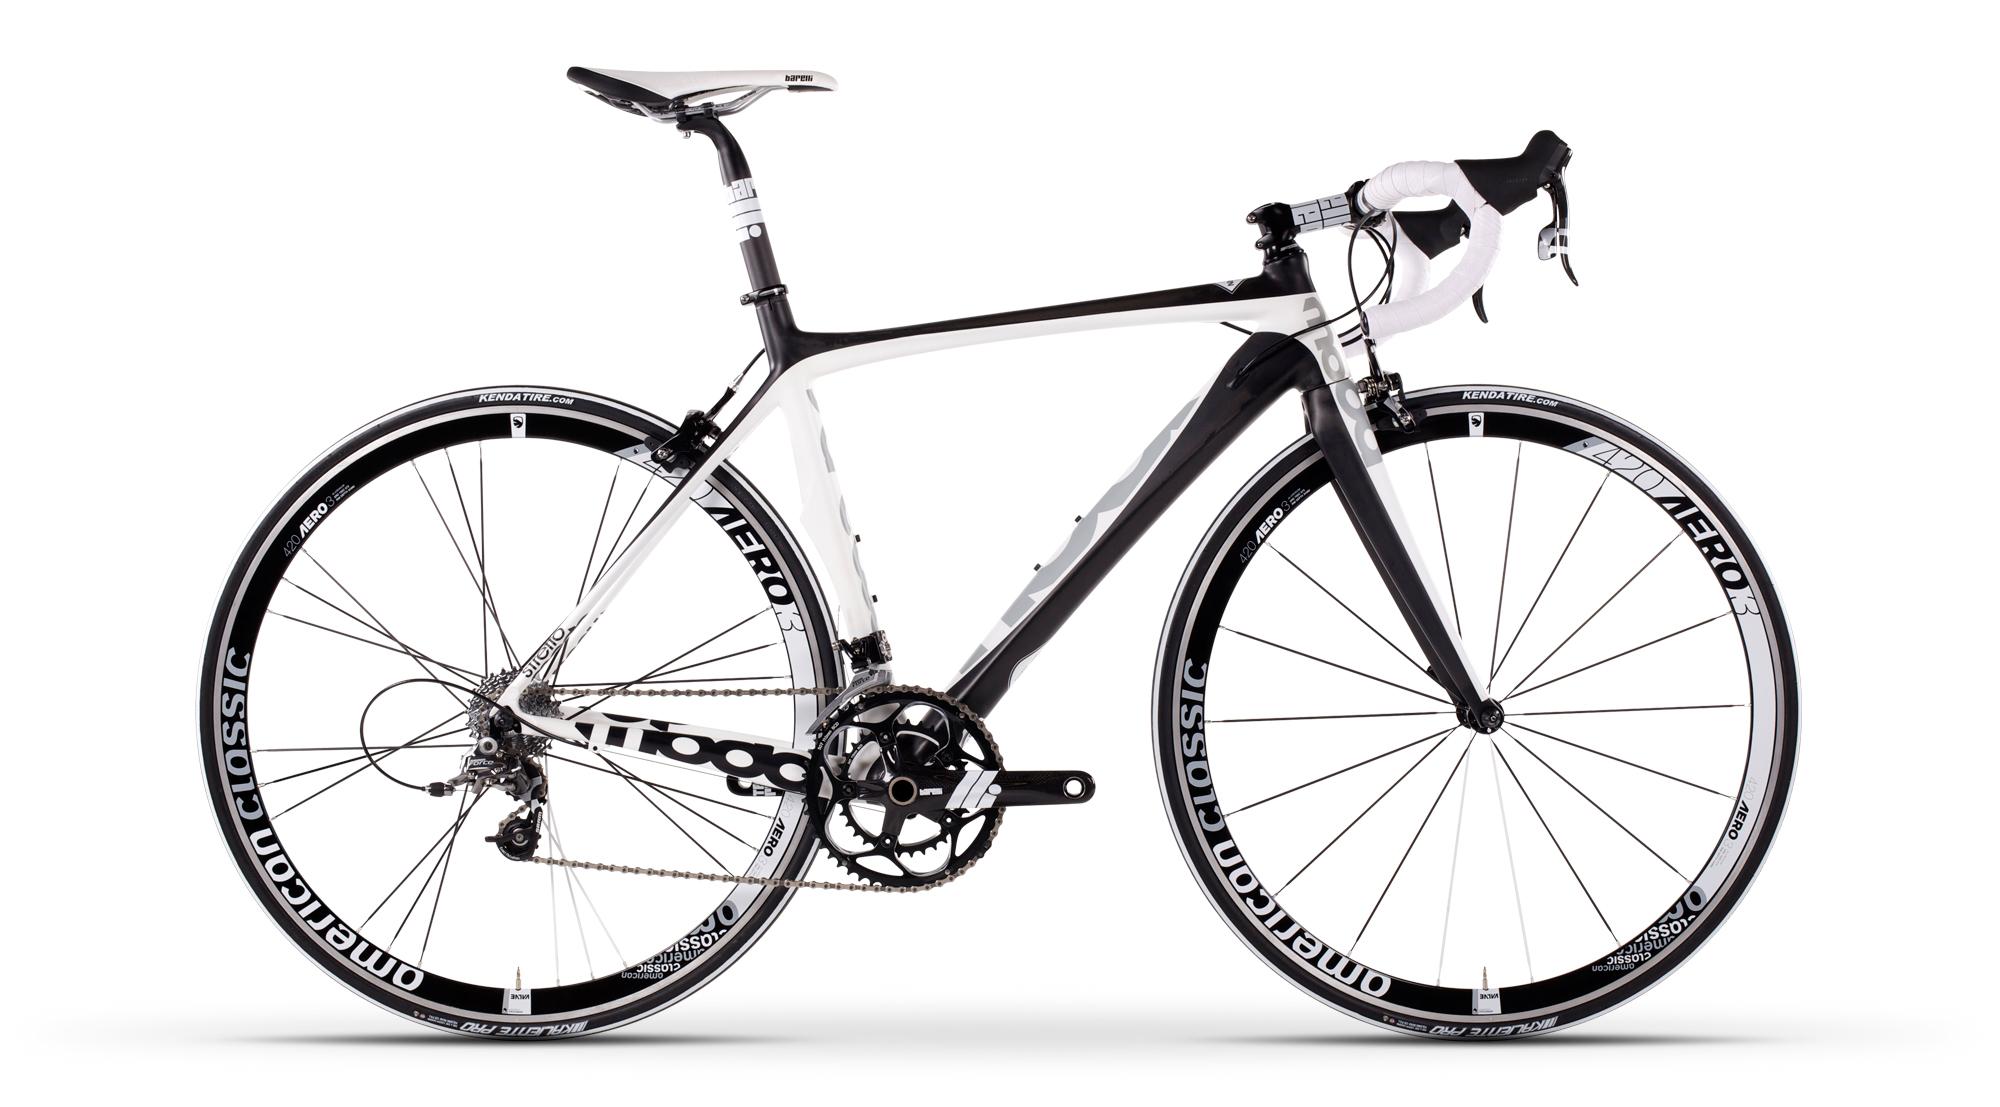 moda stretto road bike v sprint. Black Bedroom Furniture Sets. Home Design Ideas